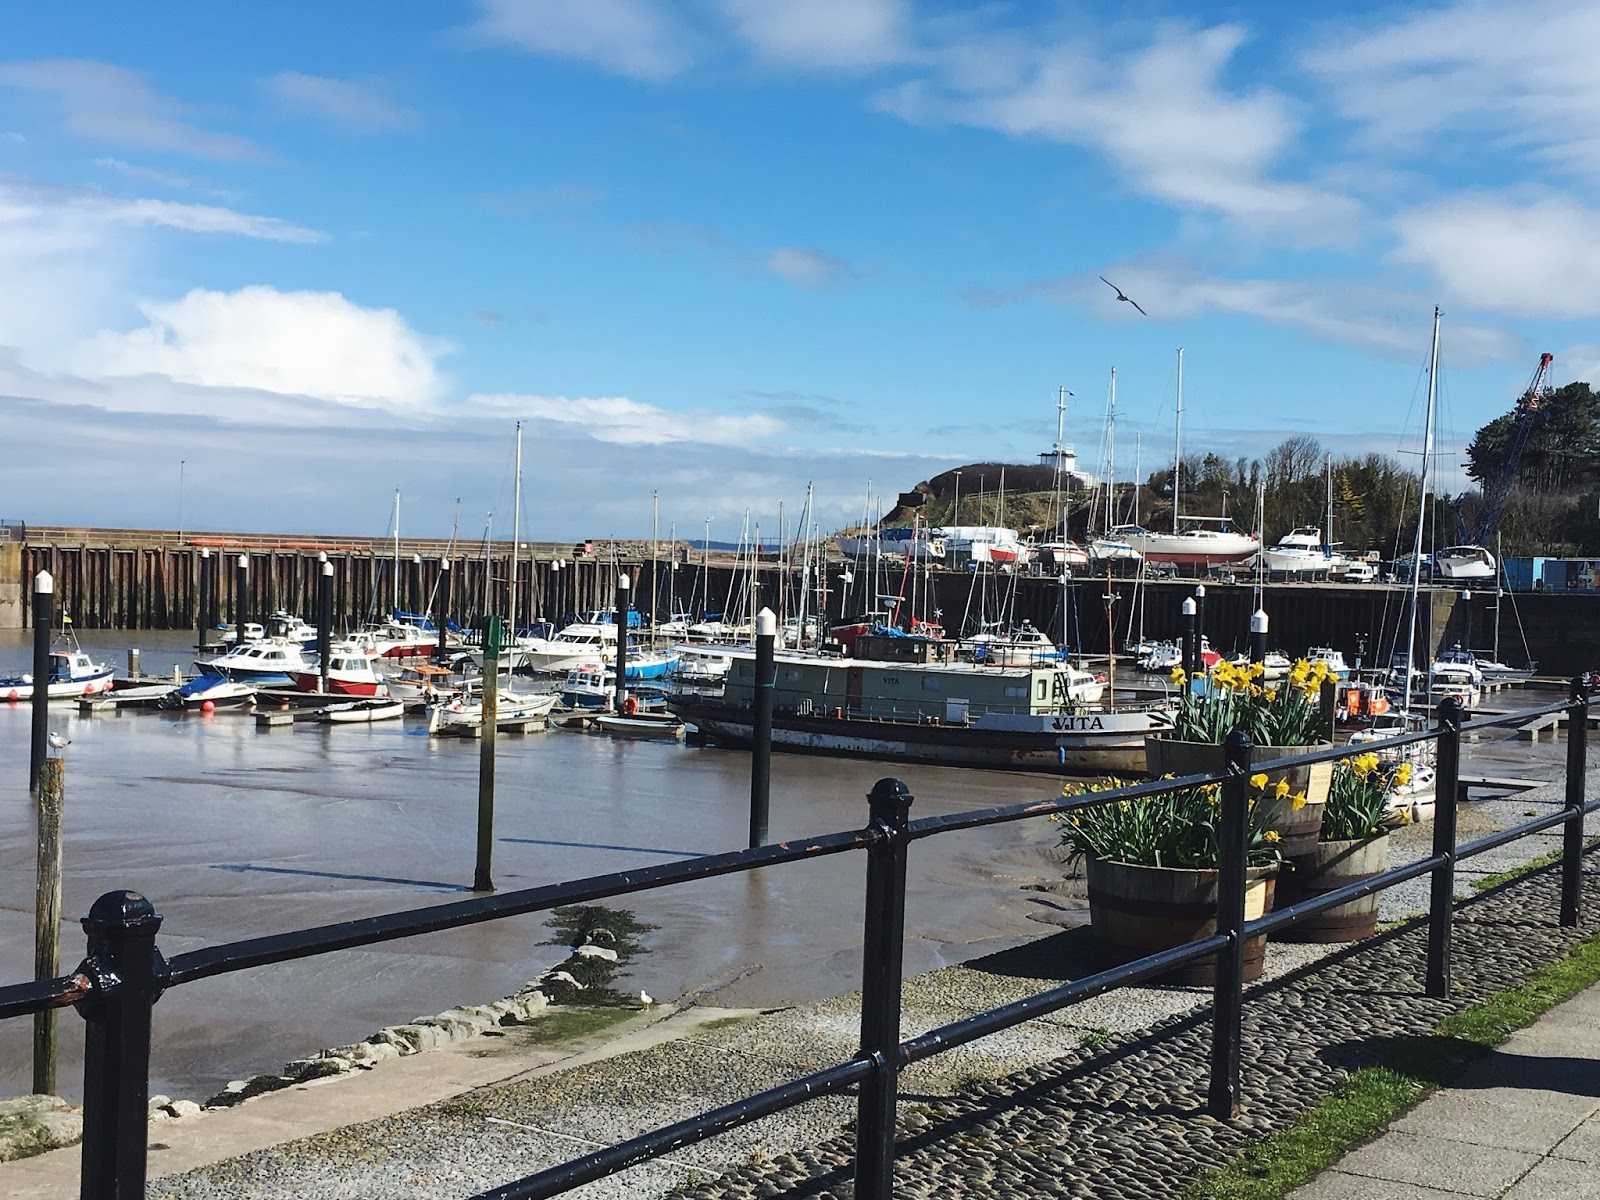 Watchet Harbour Town and Marina, Somerset